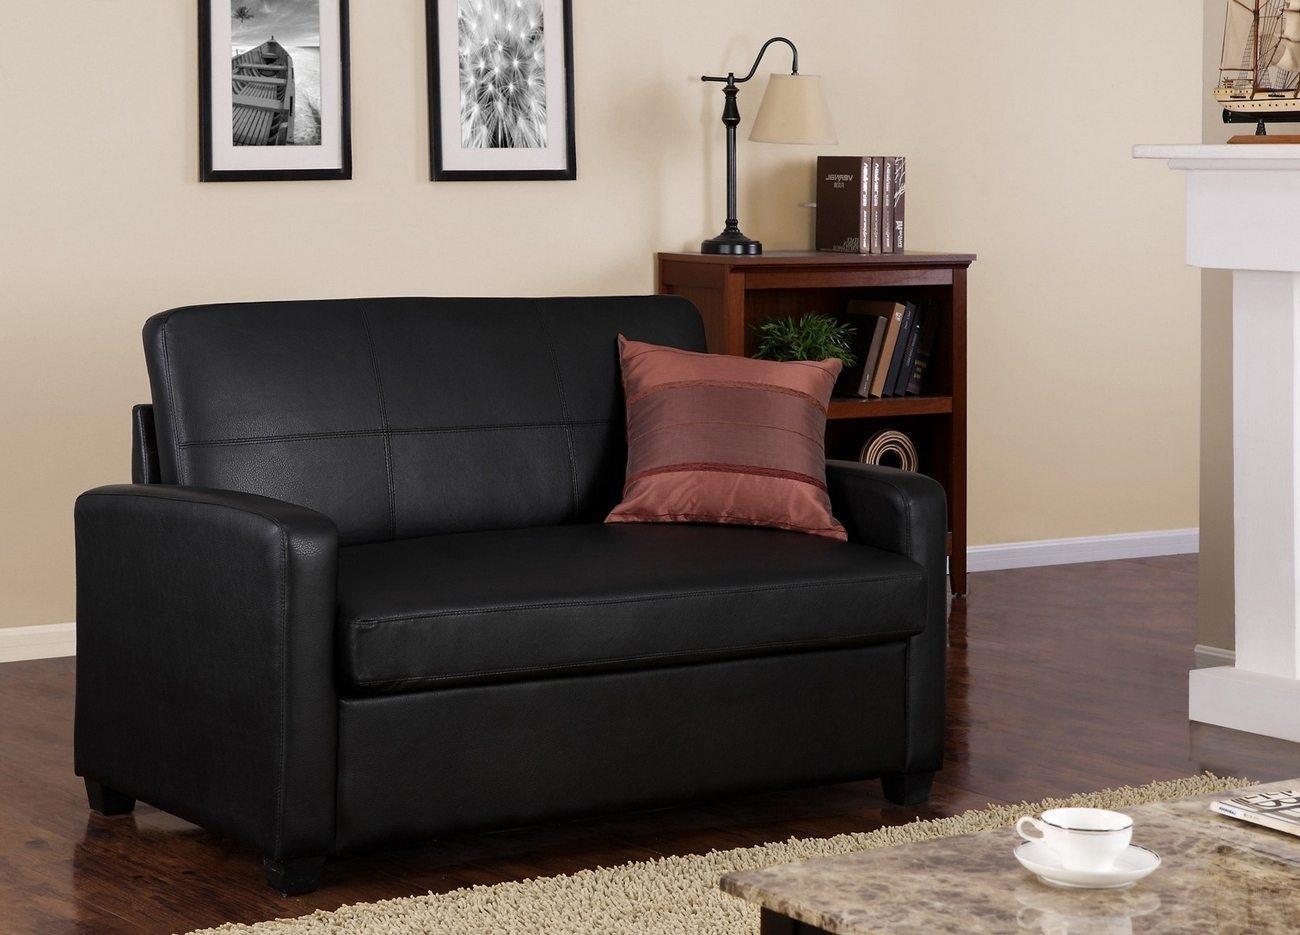 Mainstays Sleeper Sofa Mainstays Sofa Sleeper Black Faux Leather Pertaining To Mainstays Sleeper Sofas (Image 7 of 20)